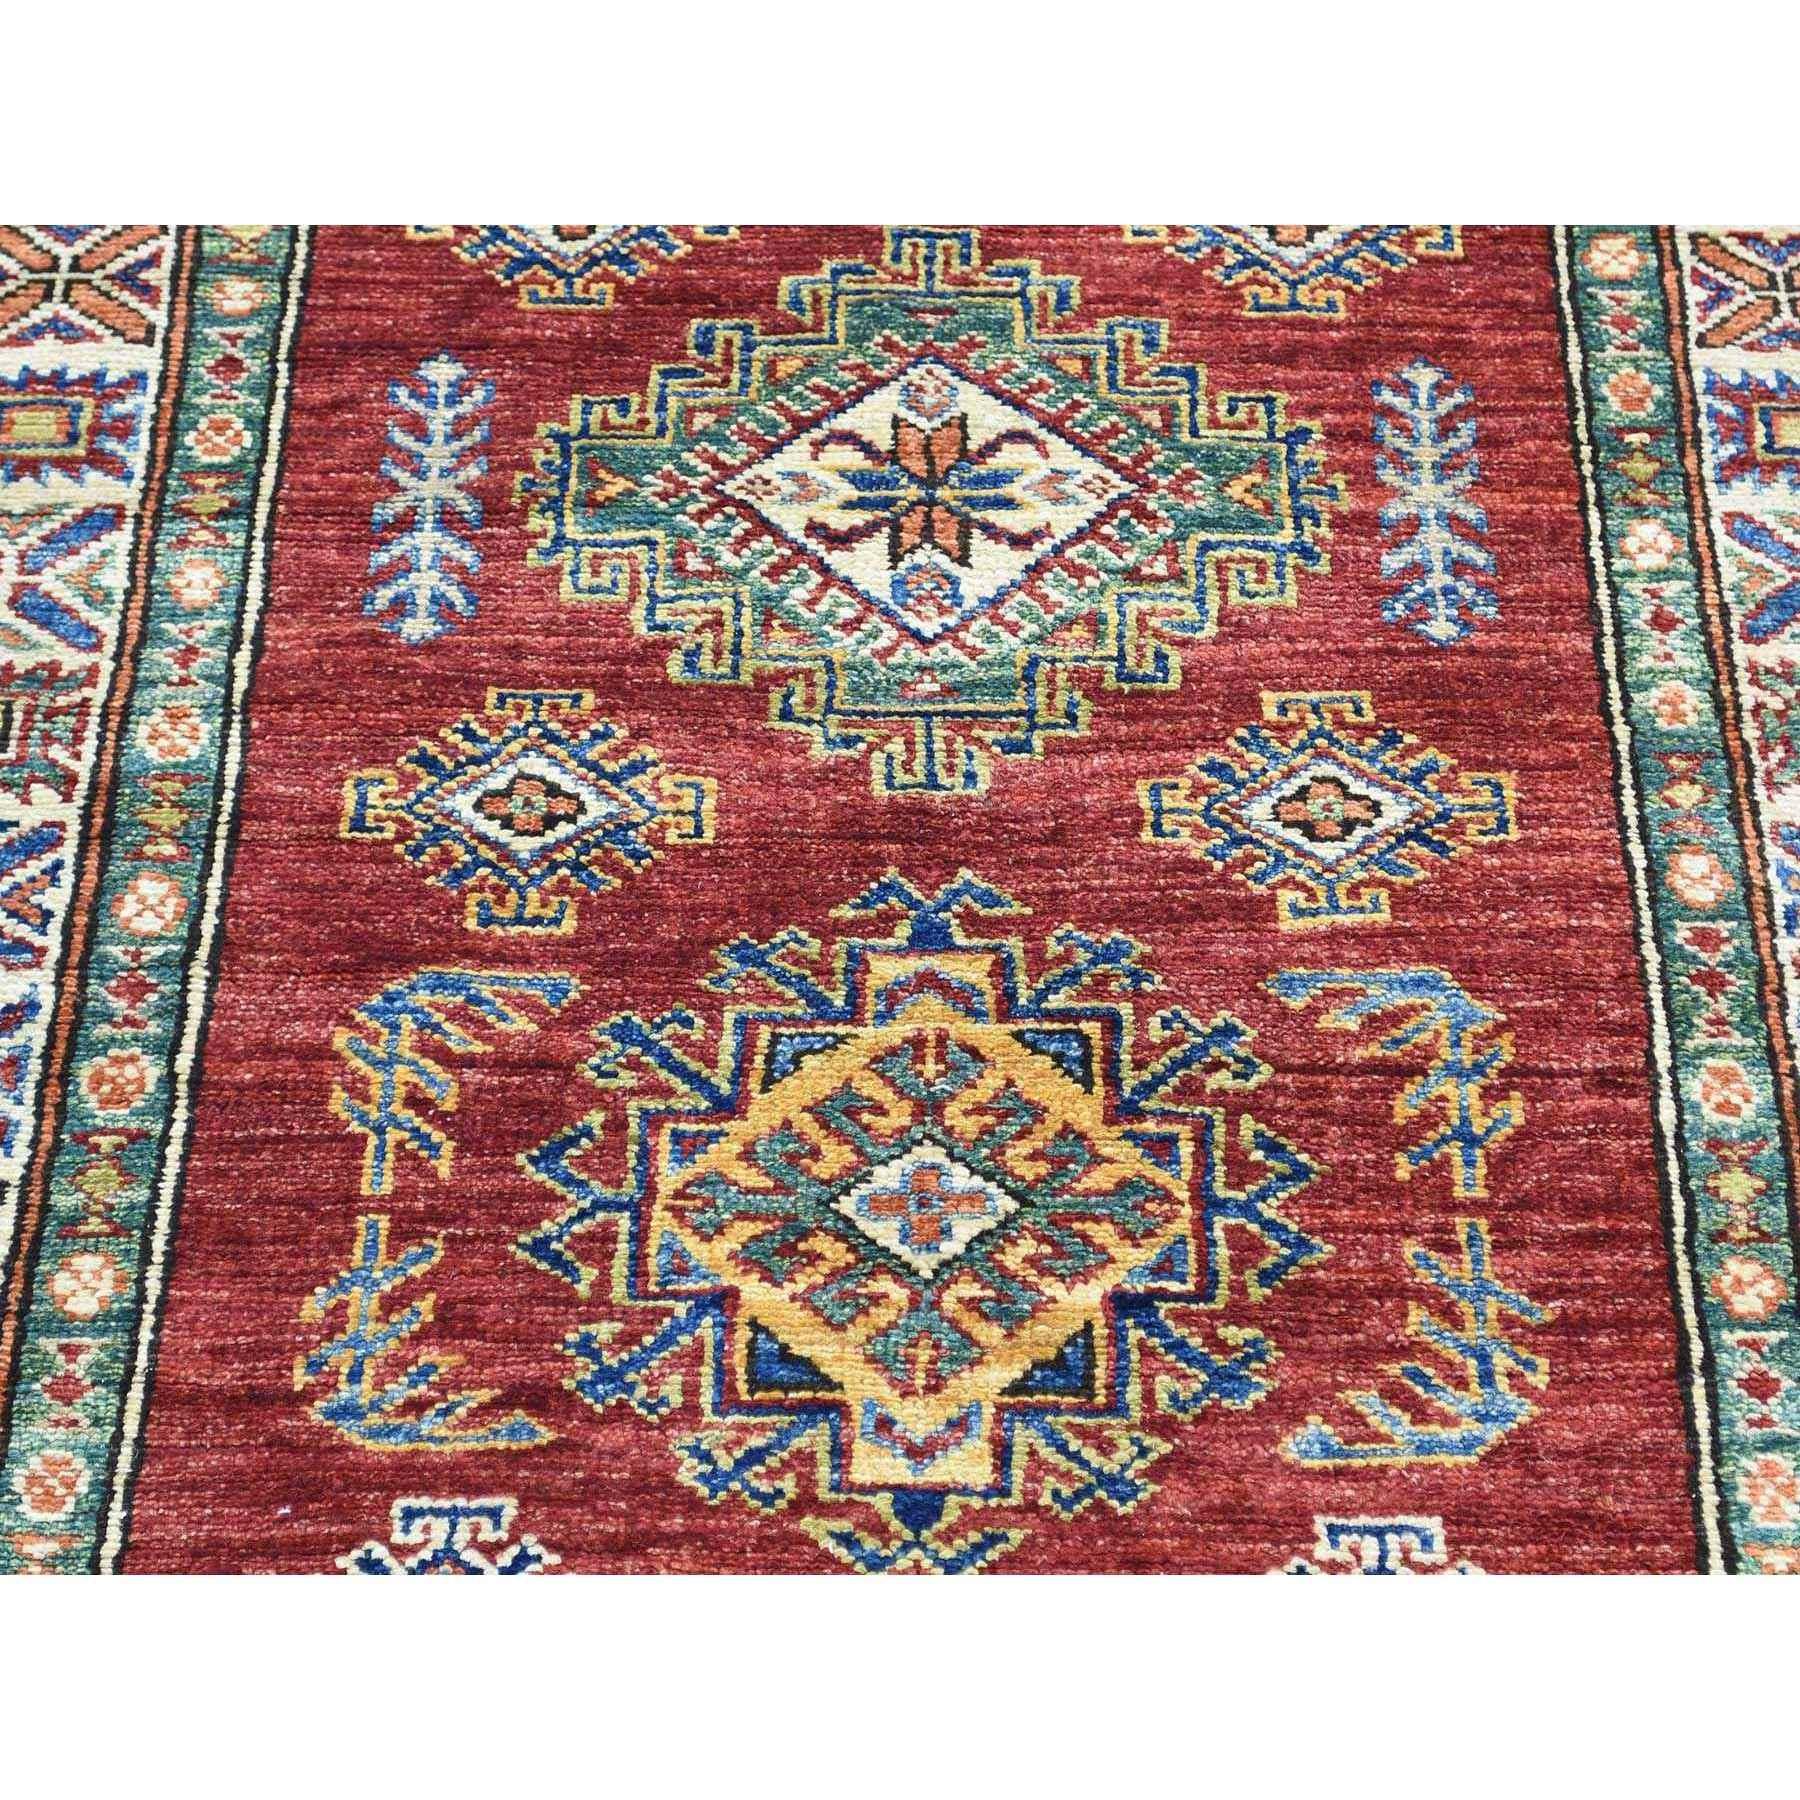 2-9 x17-6  Hand-Knotted Super Kazak XL Runner Pure Wool Oriental Rug